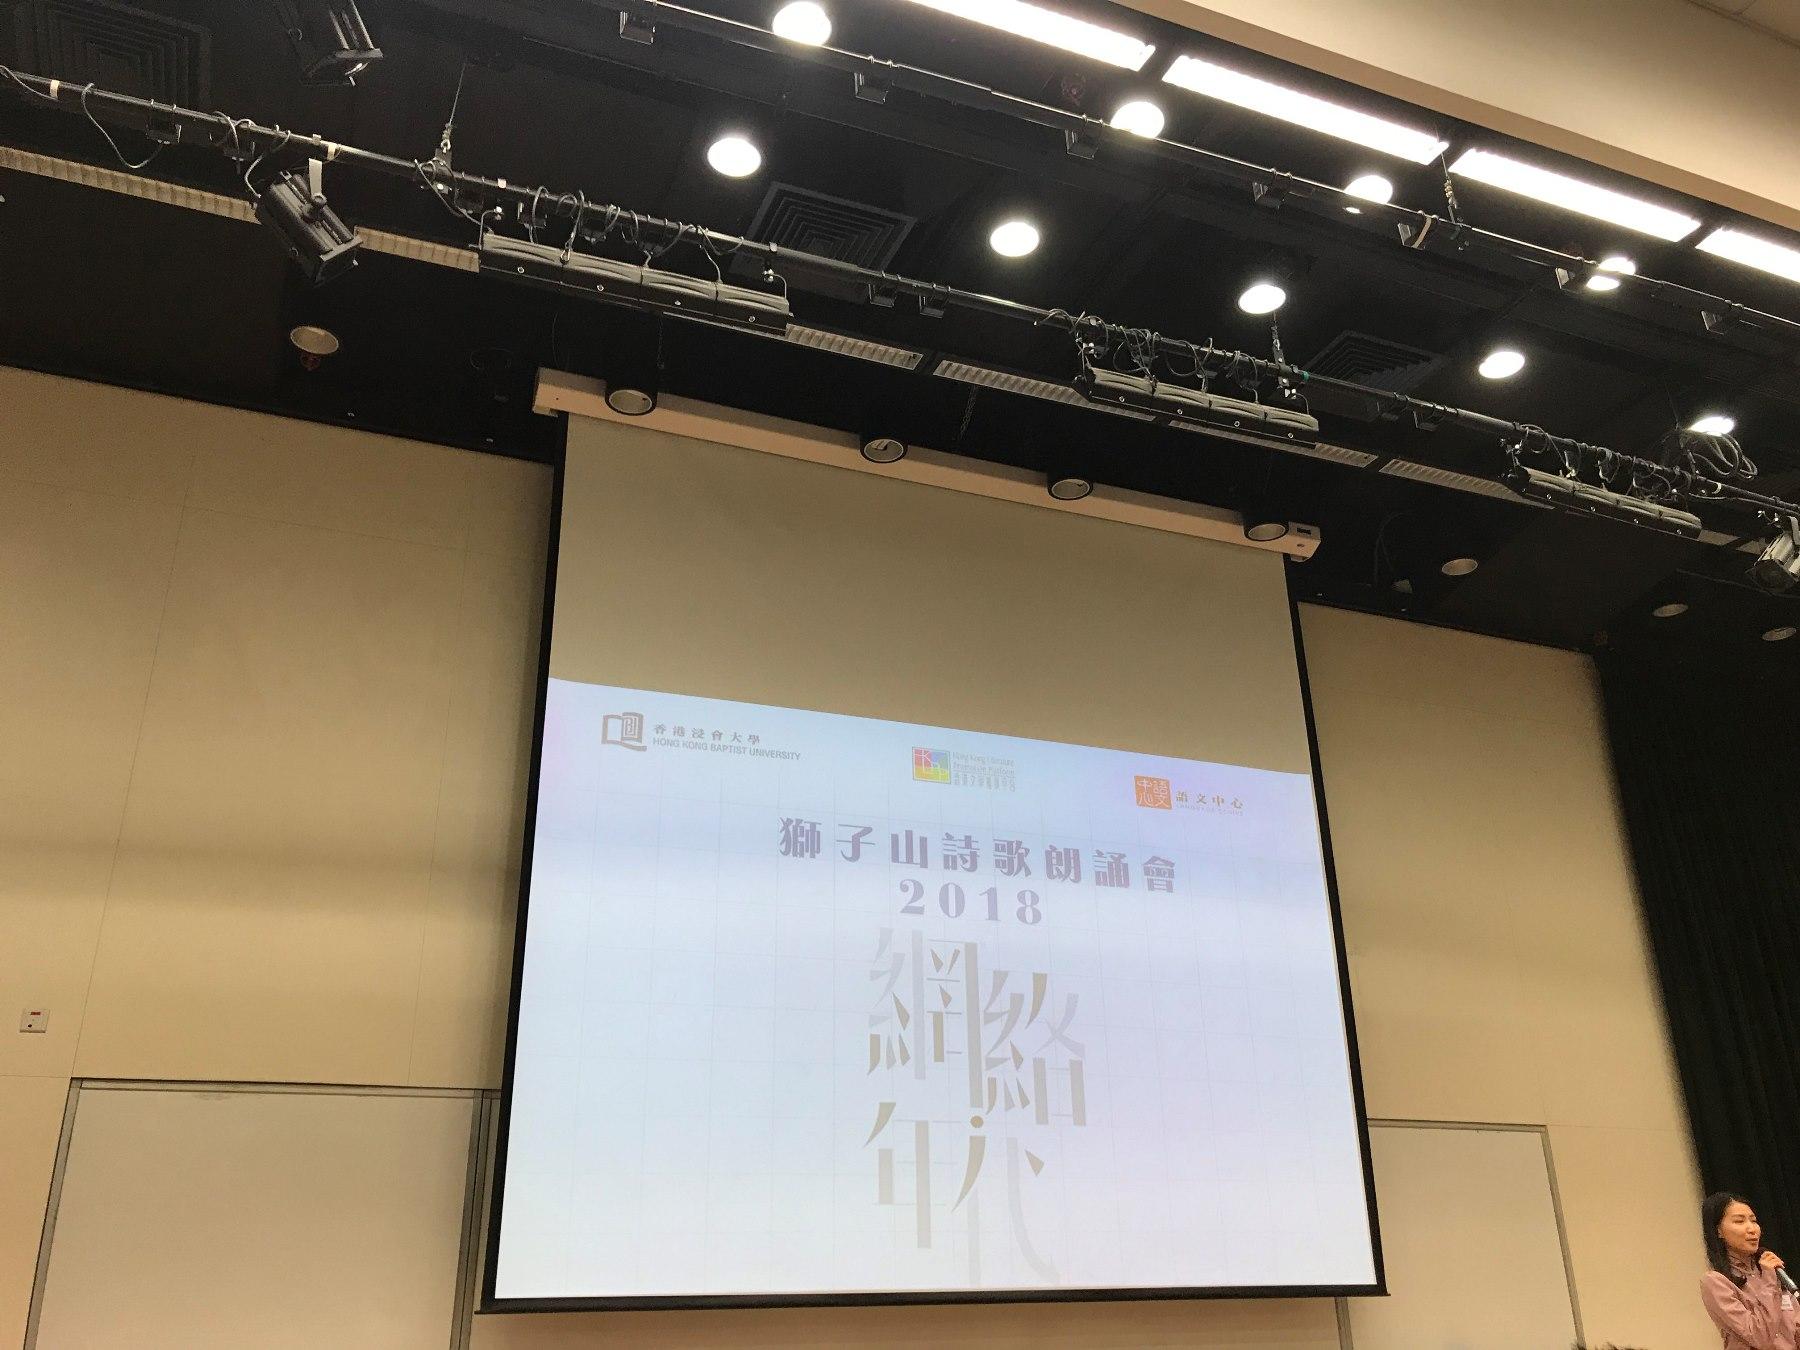 https://www.npc.edu.hk/sites/default/files/img_6198.jpeg